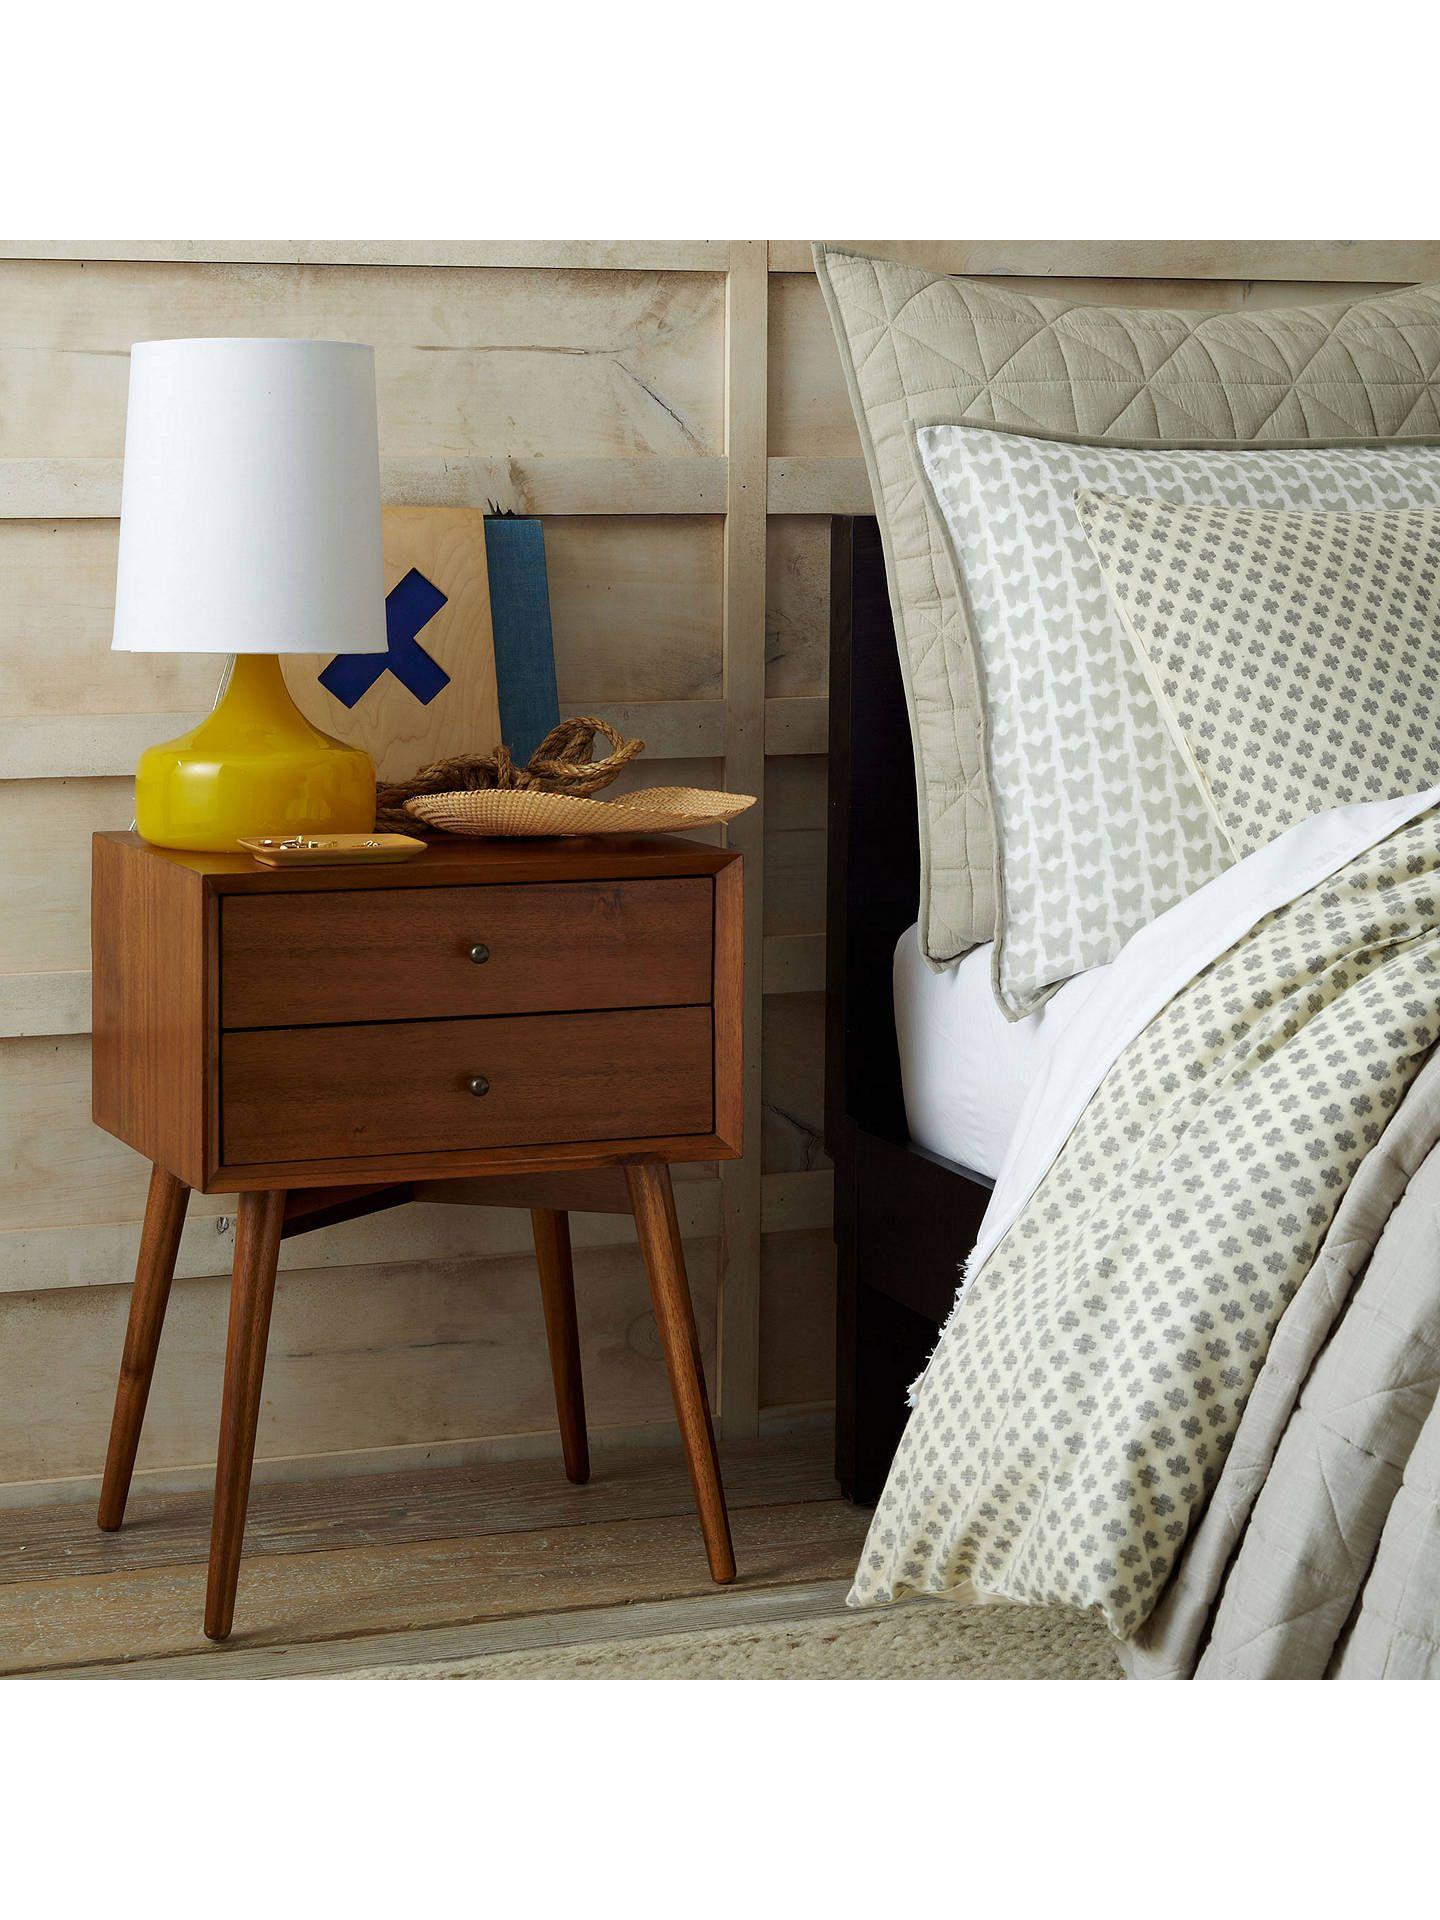 Best West Elm Mid Century Bedside Table Acorn In 2019 Mid 400 x 300